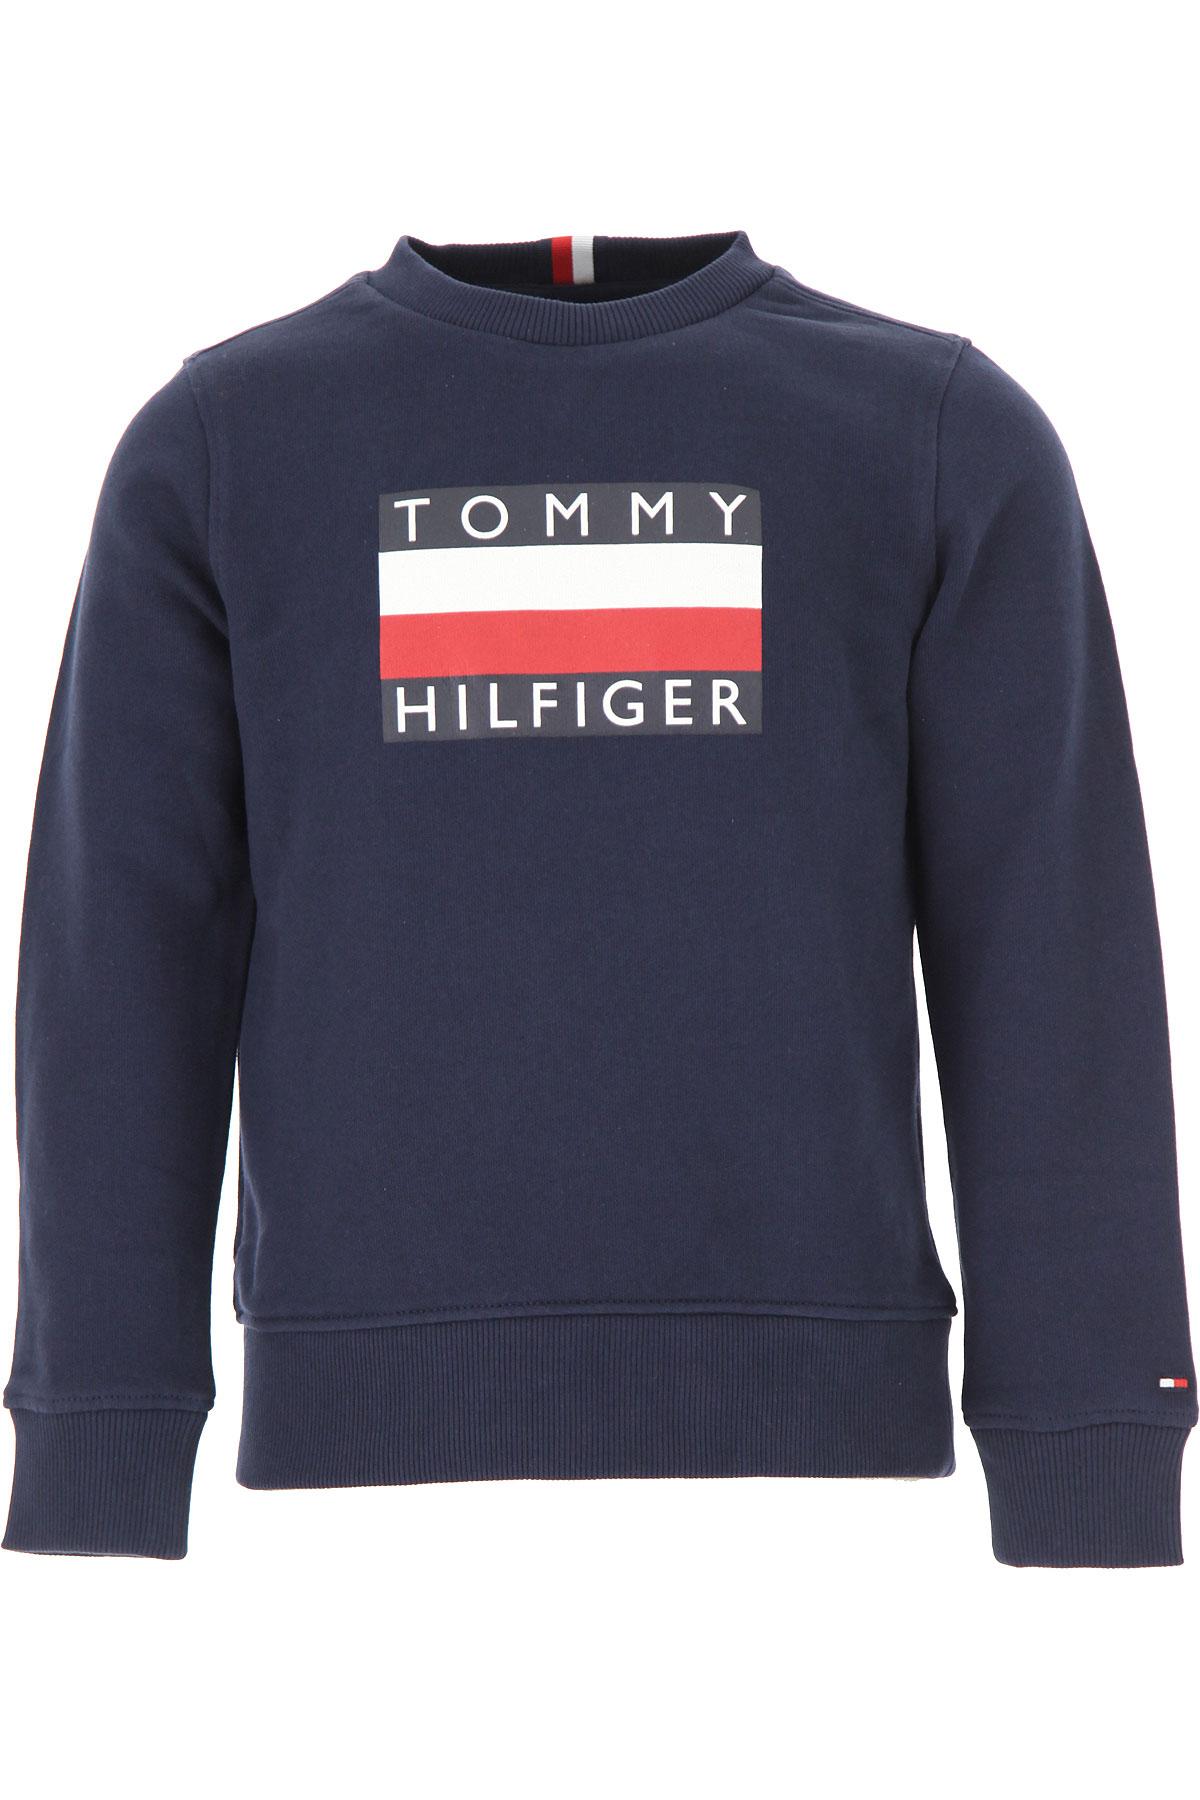 Tommy Hilfiger Kids Sweatshirts & Hoodies for Boys On Sale, Midnight Blue, Cotton, 2019, 4Y 6Y